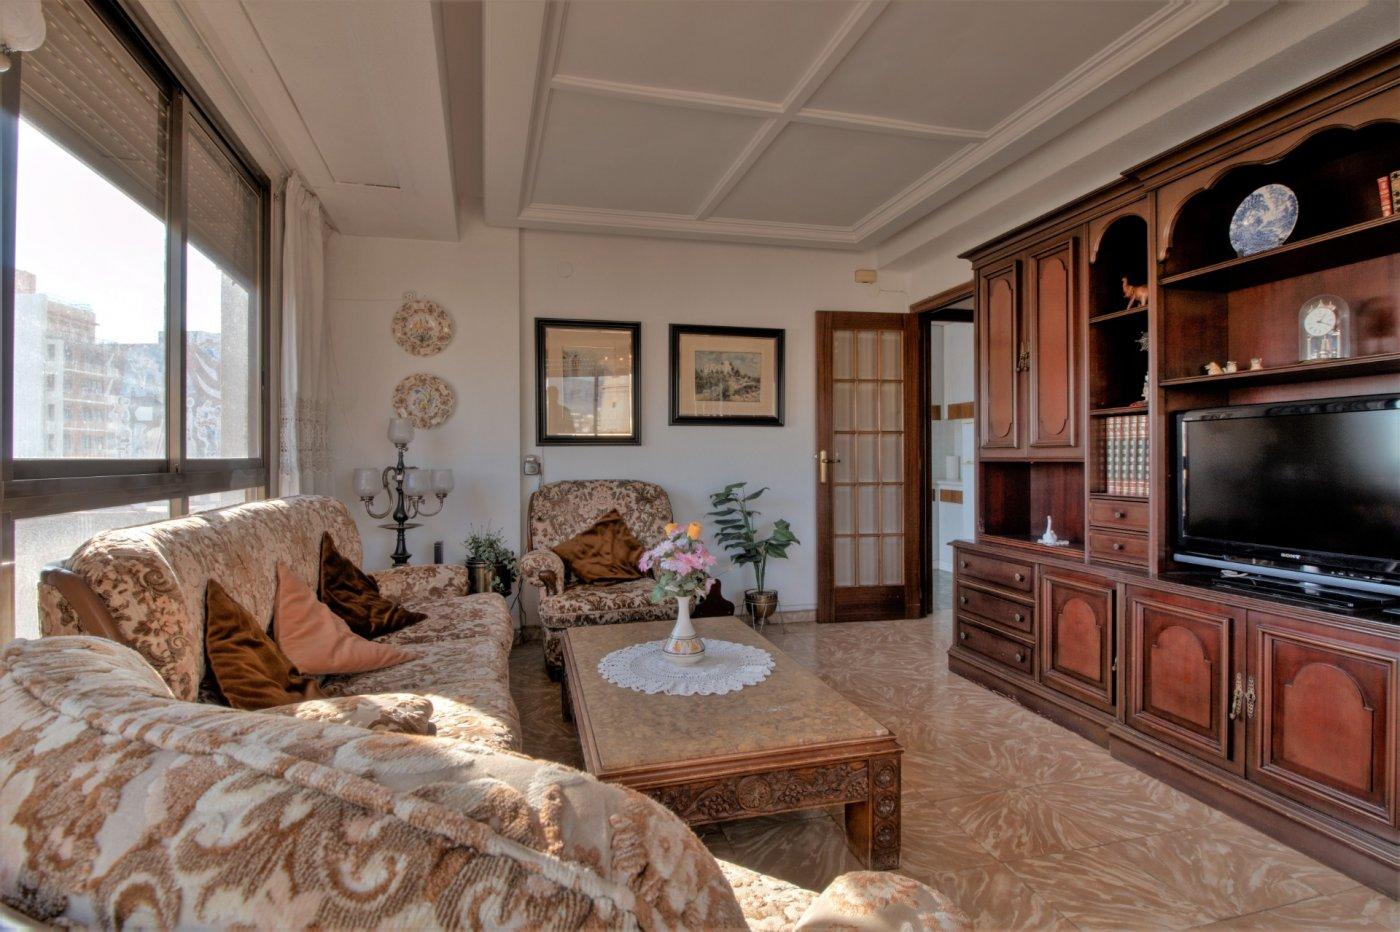 piso en castellon---castello-de-la-plana · santa-clara 149000€